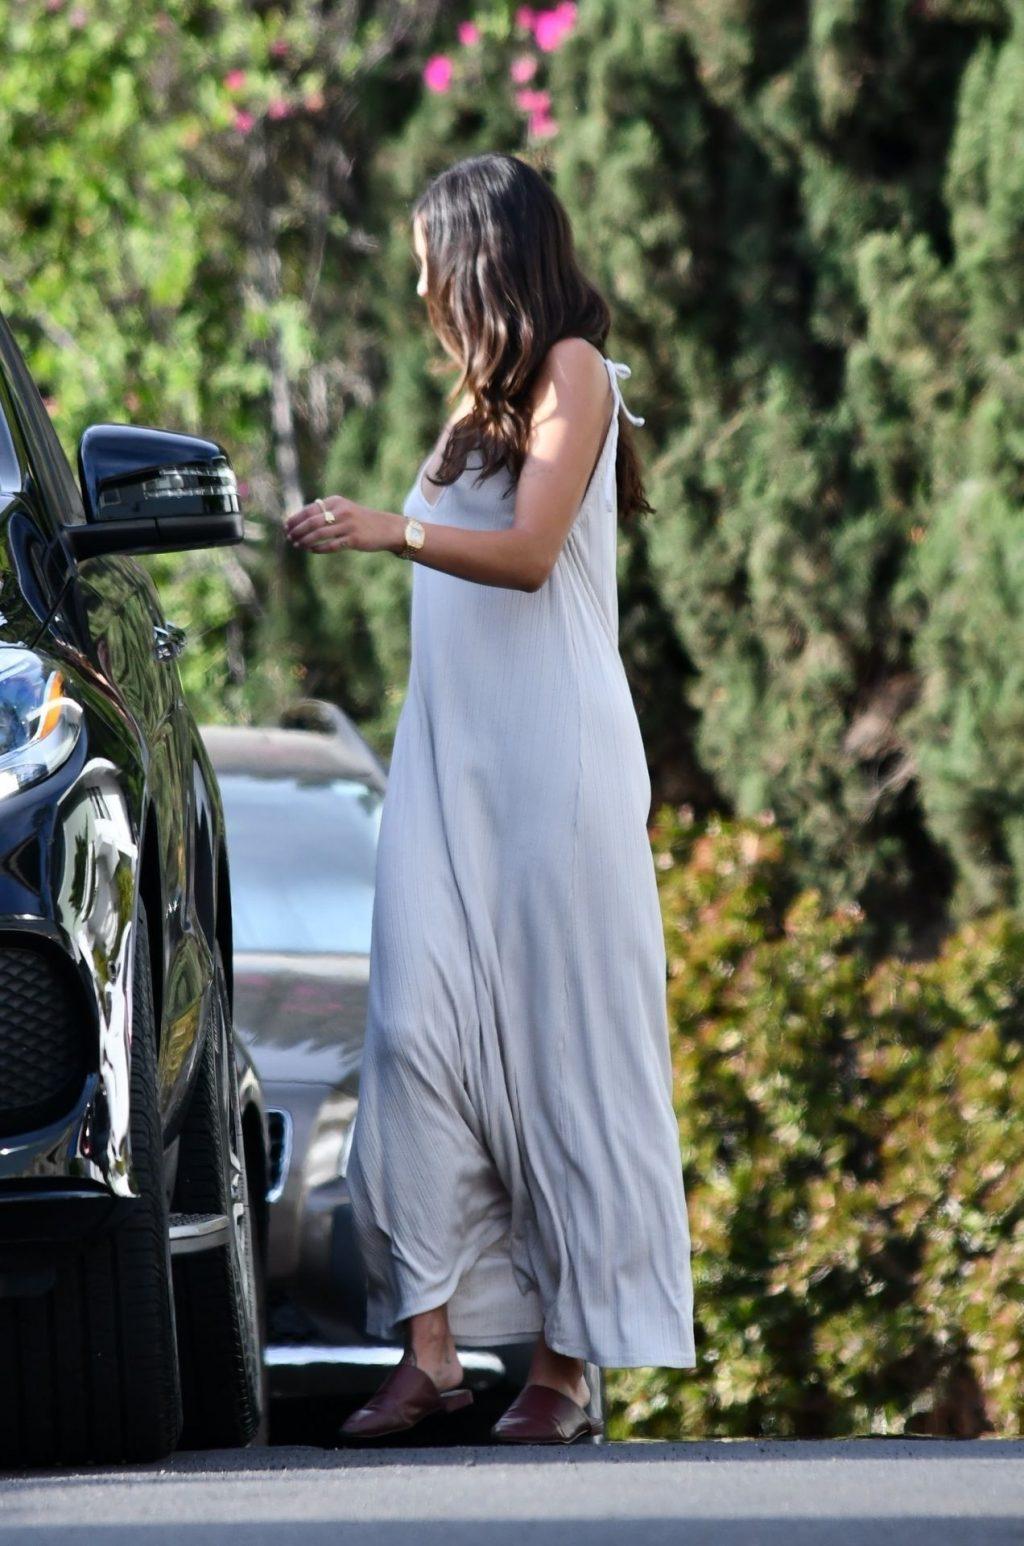 Eiza Gonzalez Wears a Full-length Backless Dress to Visit a Friend (11 Photos)